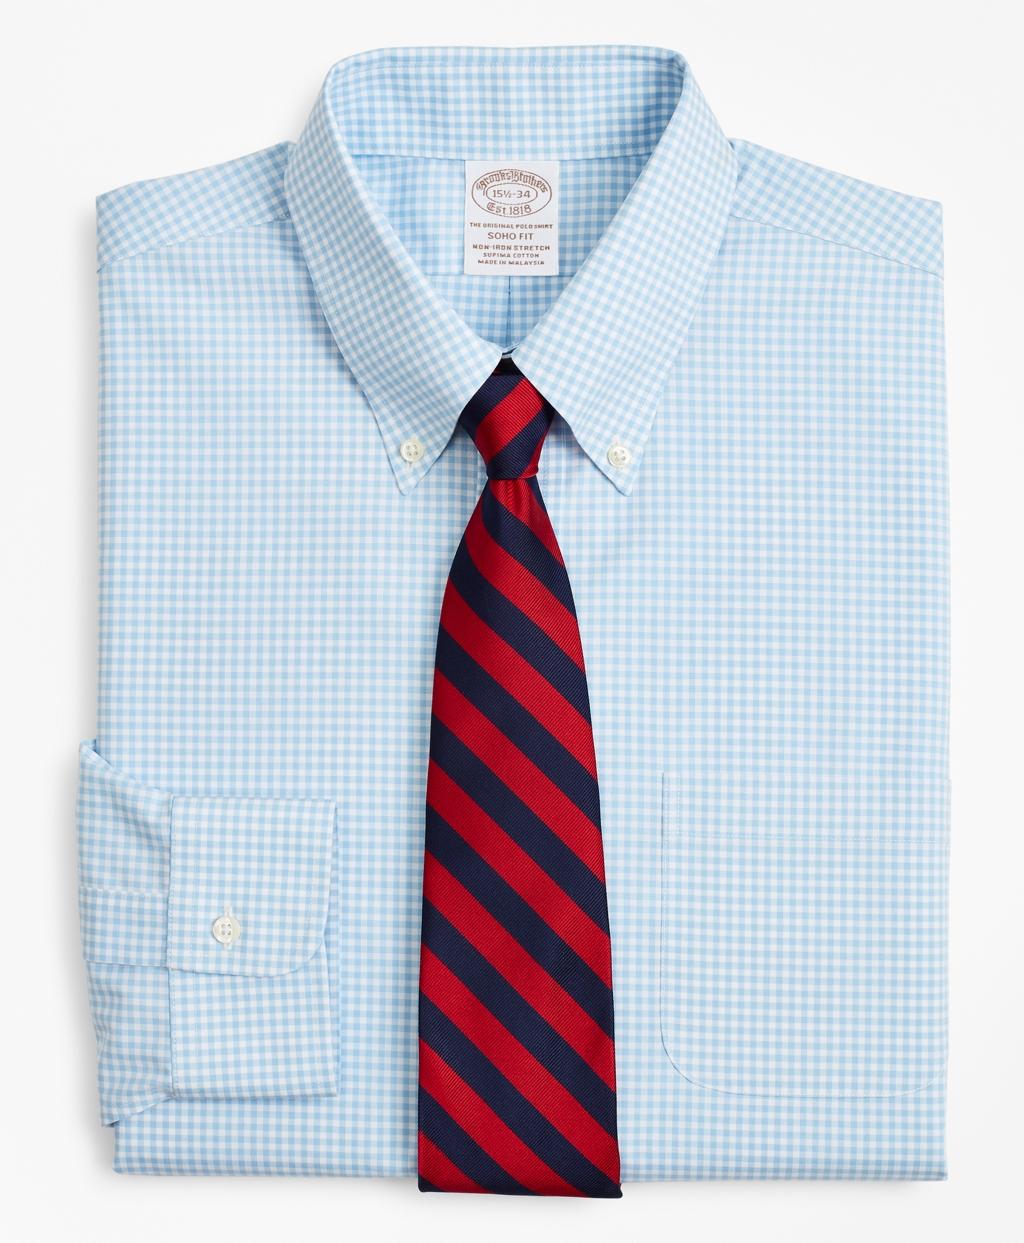 Brooksbrothers Stretch Soho Extra-Slim-Fit Dress Shirt, Non-Iron Poplin Button-Down Collar Gingham